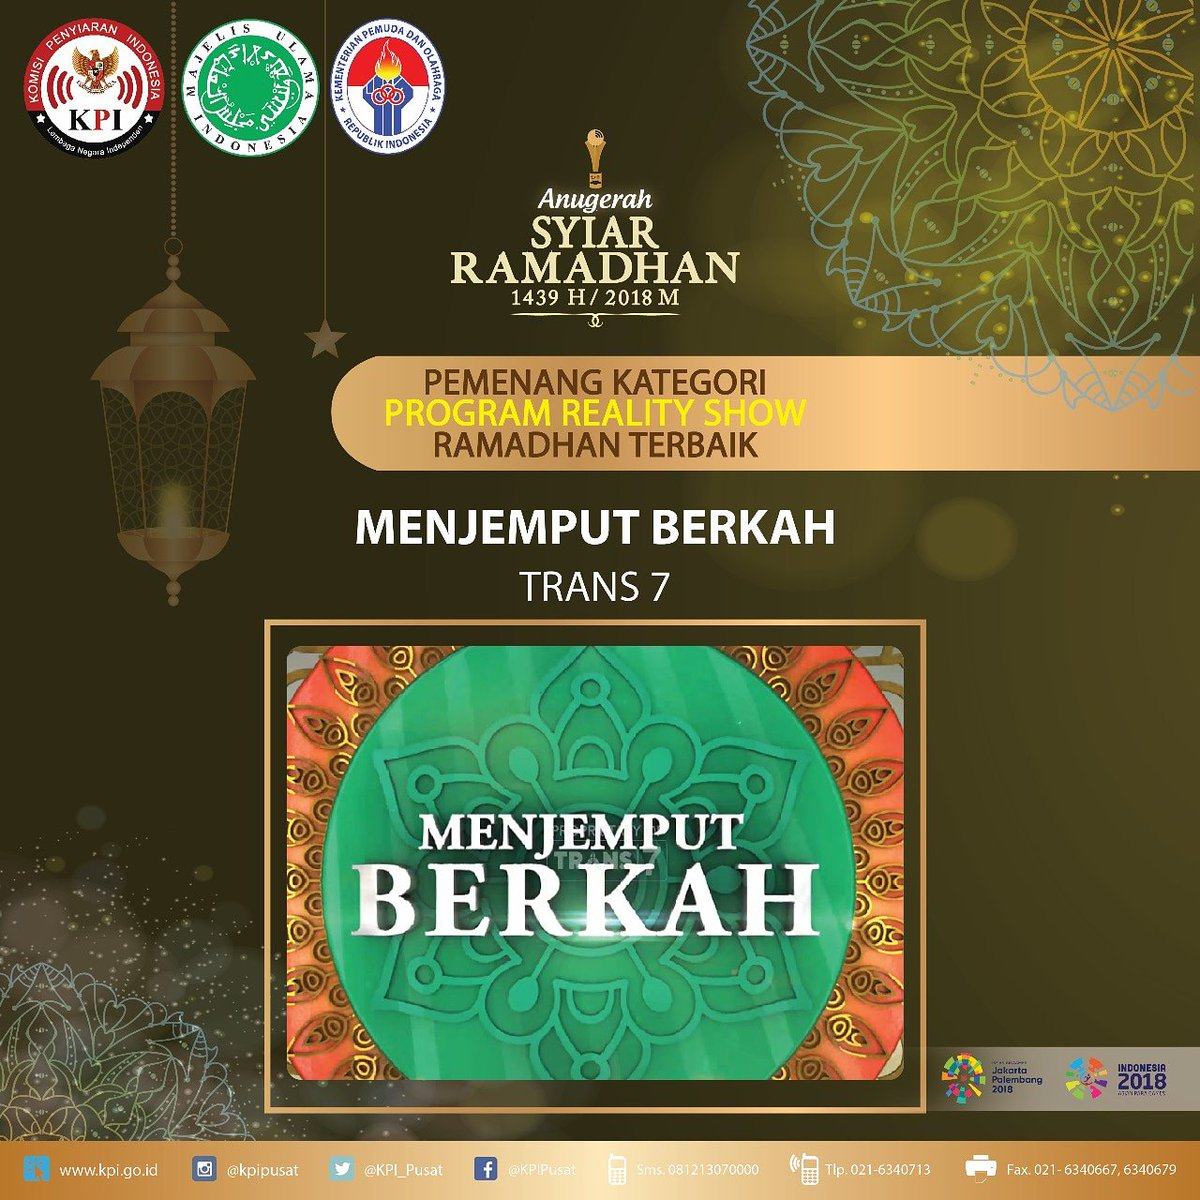 Pemenang anugerah syiar ramadhan 1439h 2018m kategori program reality show ramadhan terbaik menjemput berkahtrans7 trans7